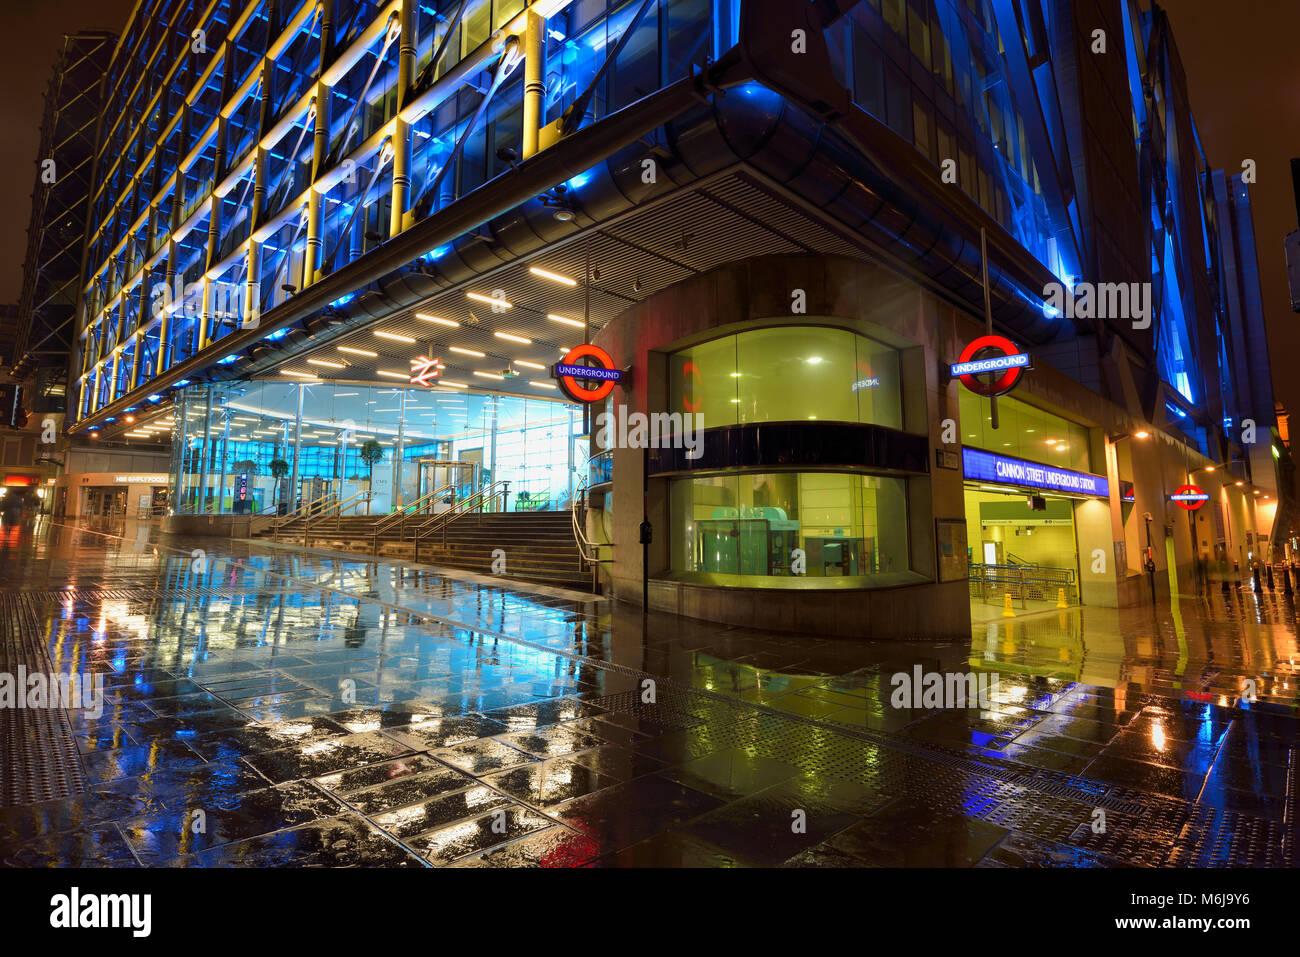 Cannon Street Rail stion at night, City of London, United Kingdom - Stock Image